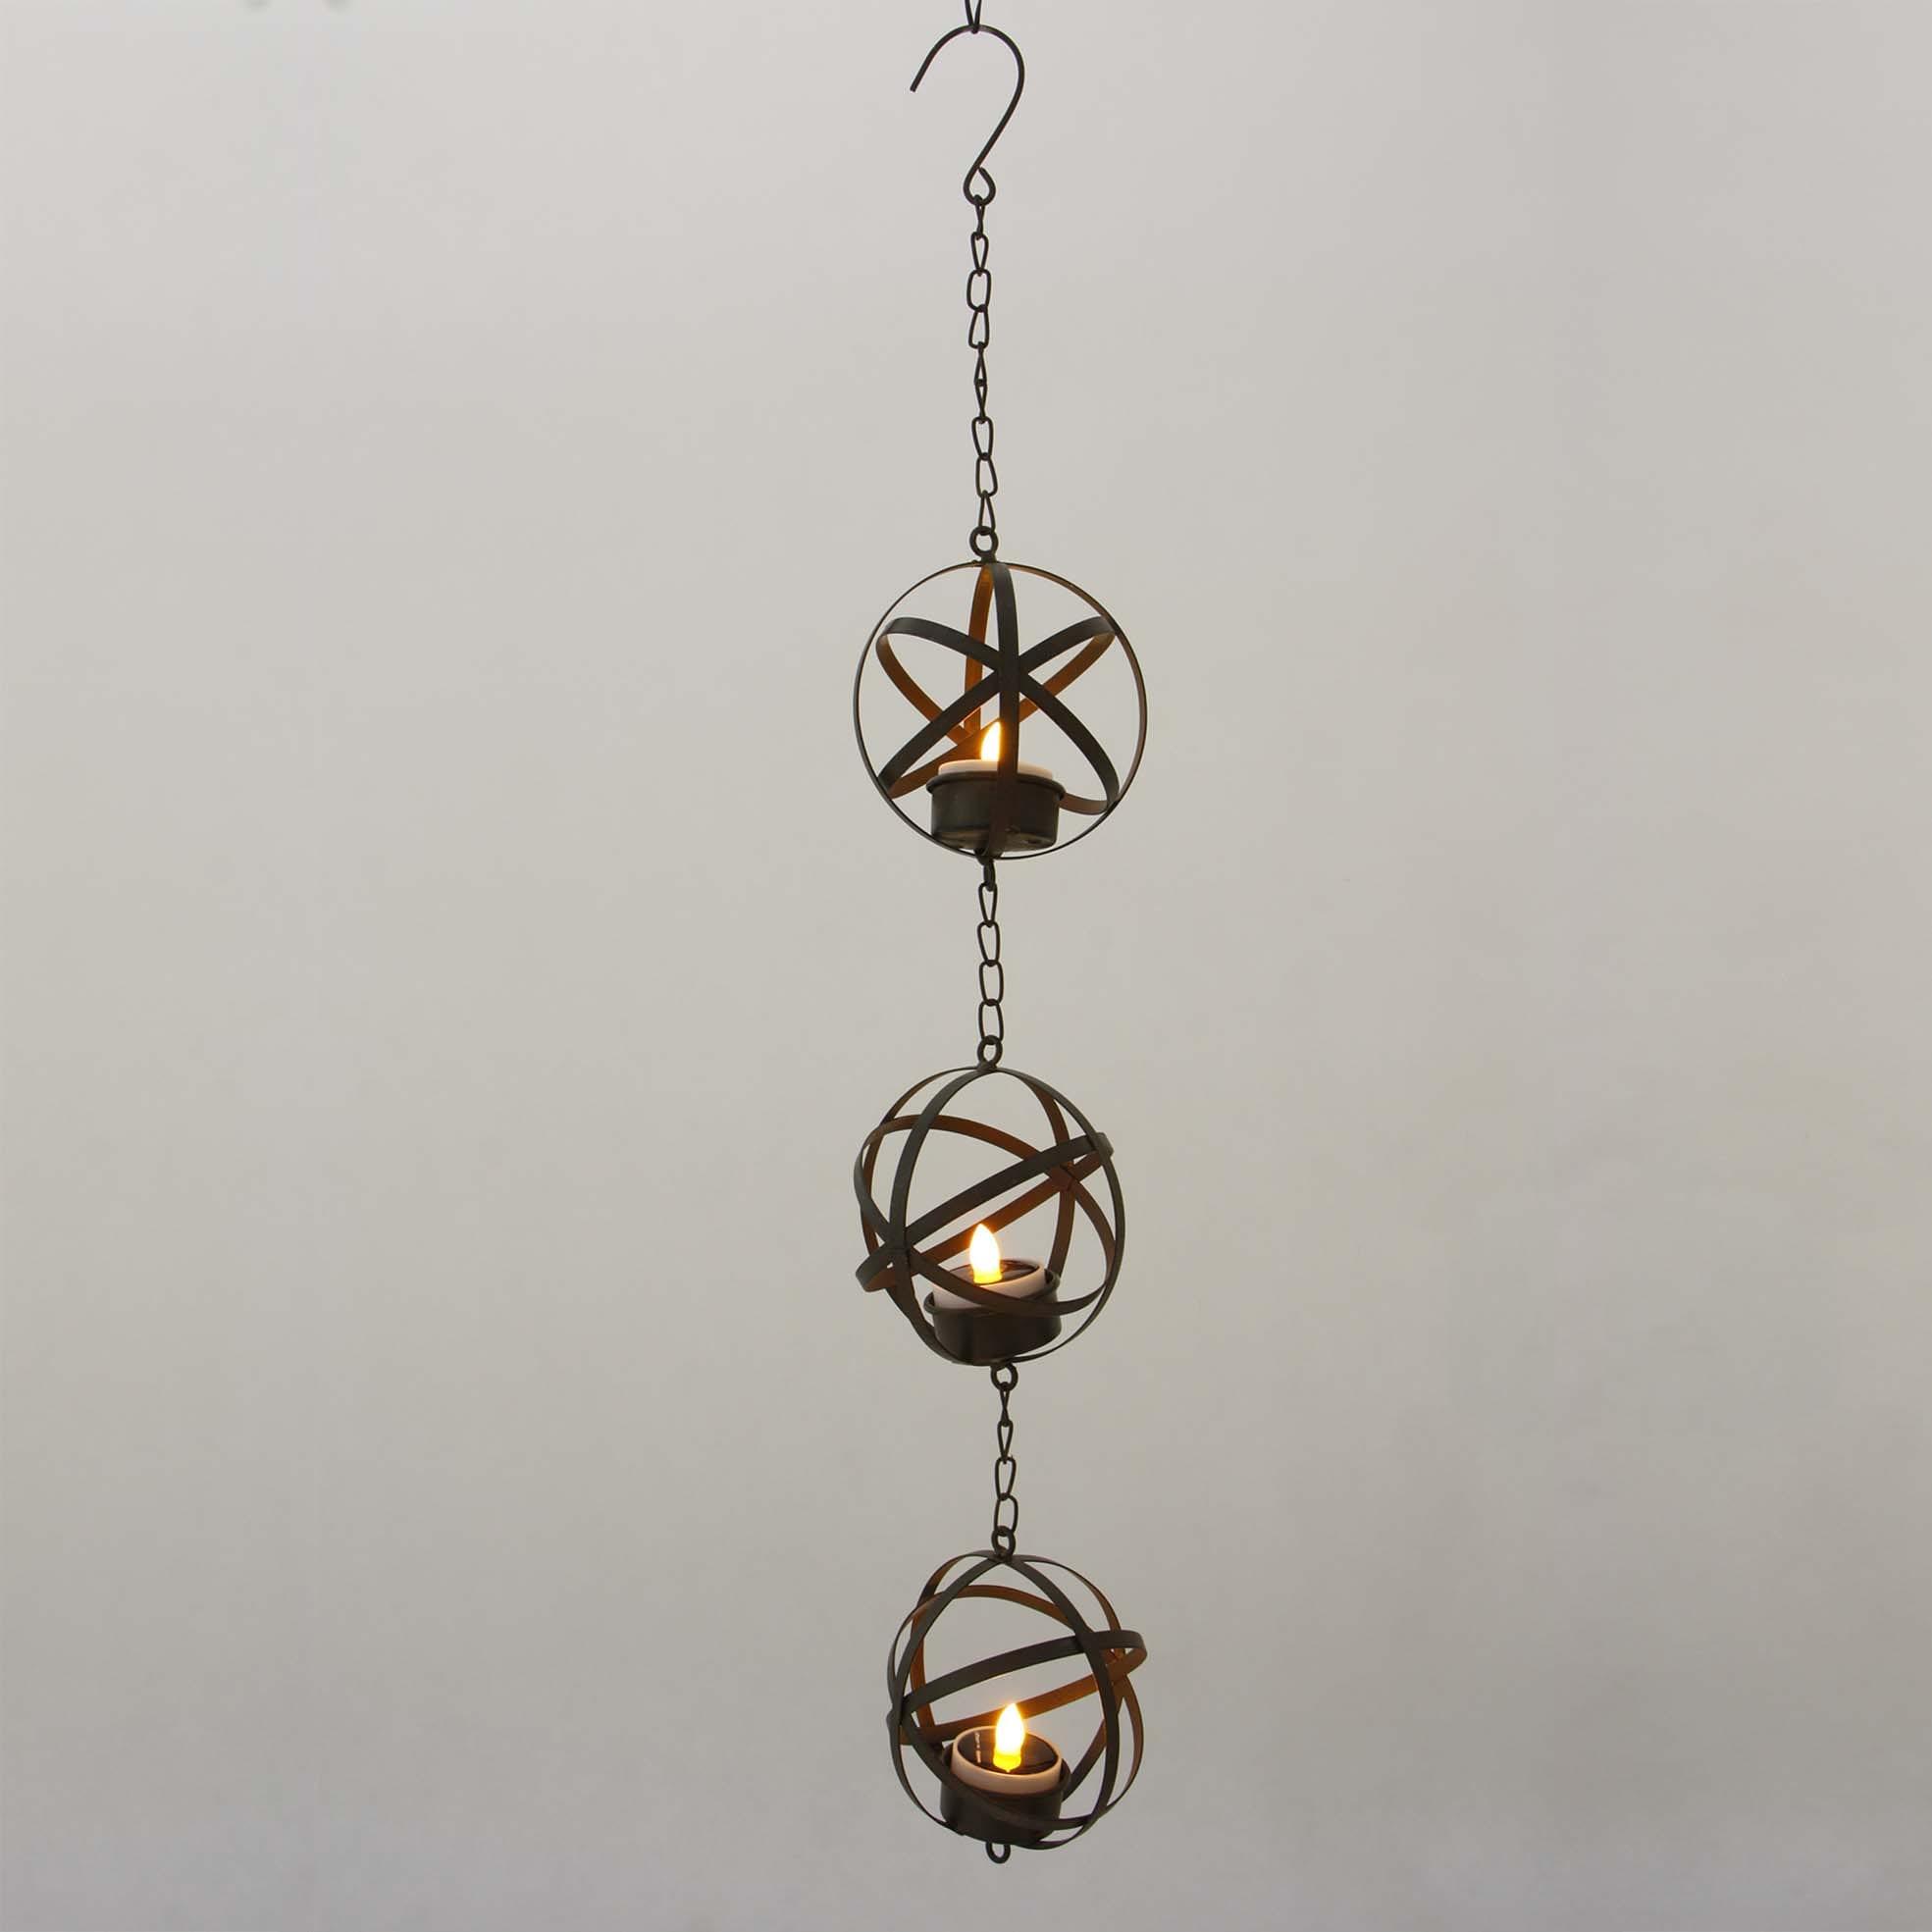 Hanging LED Tea Light Holder  MYHH05017 Featured Image